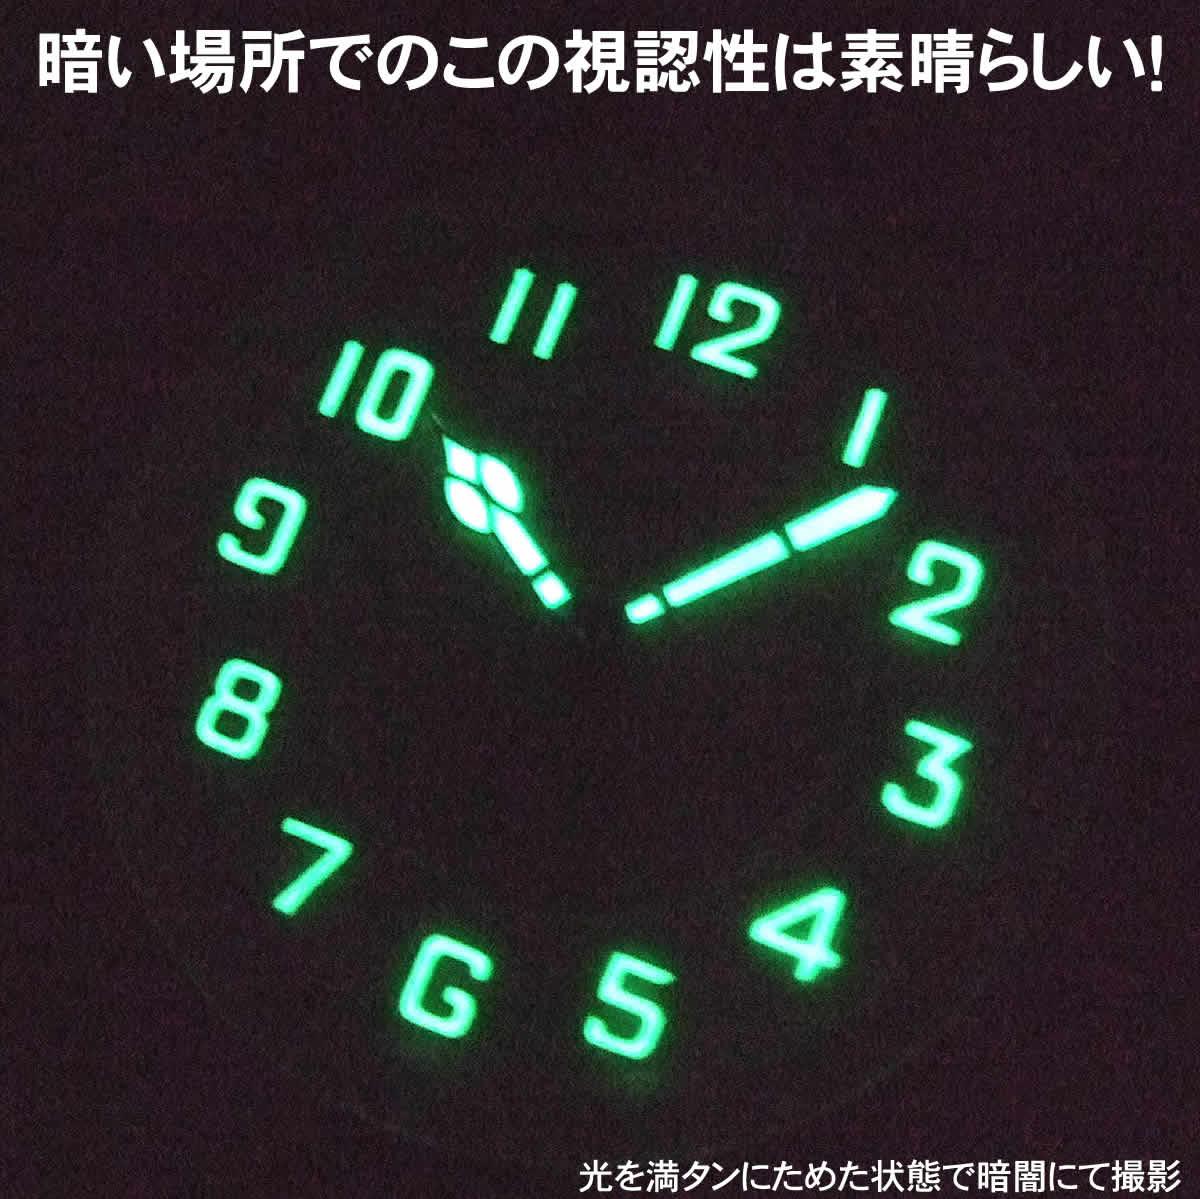 ORIS 時計 蓄光 スーパールミノバ